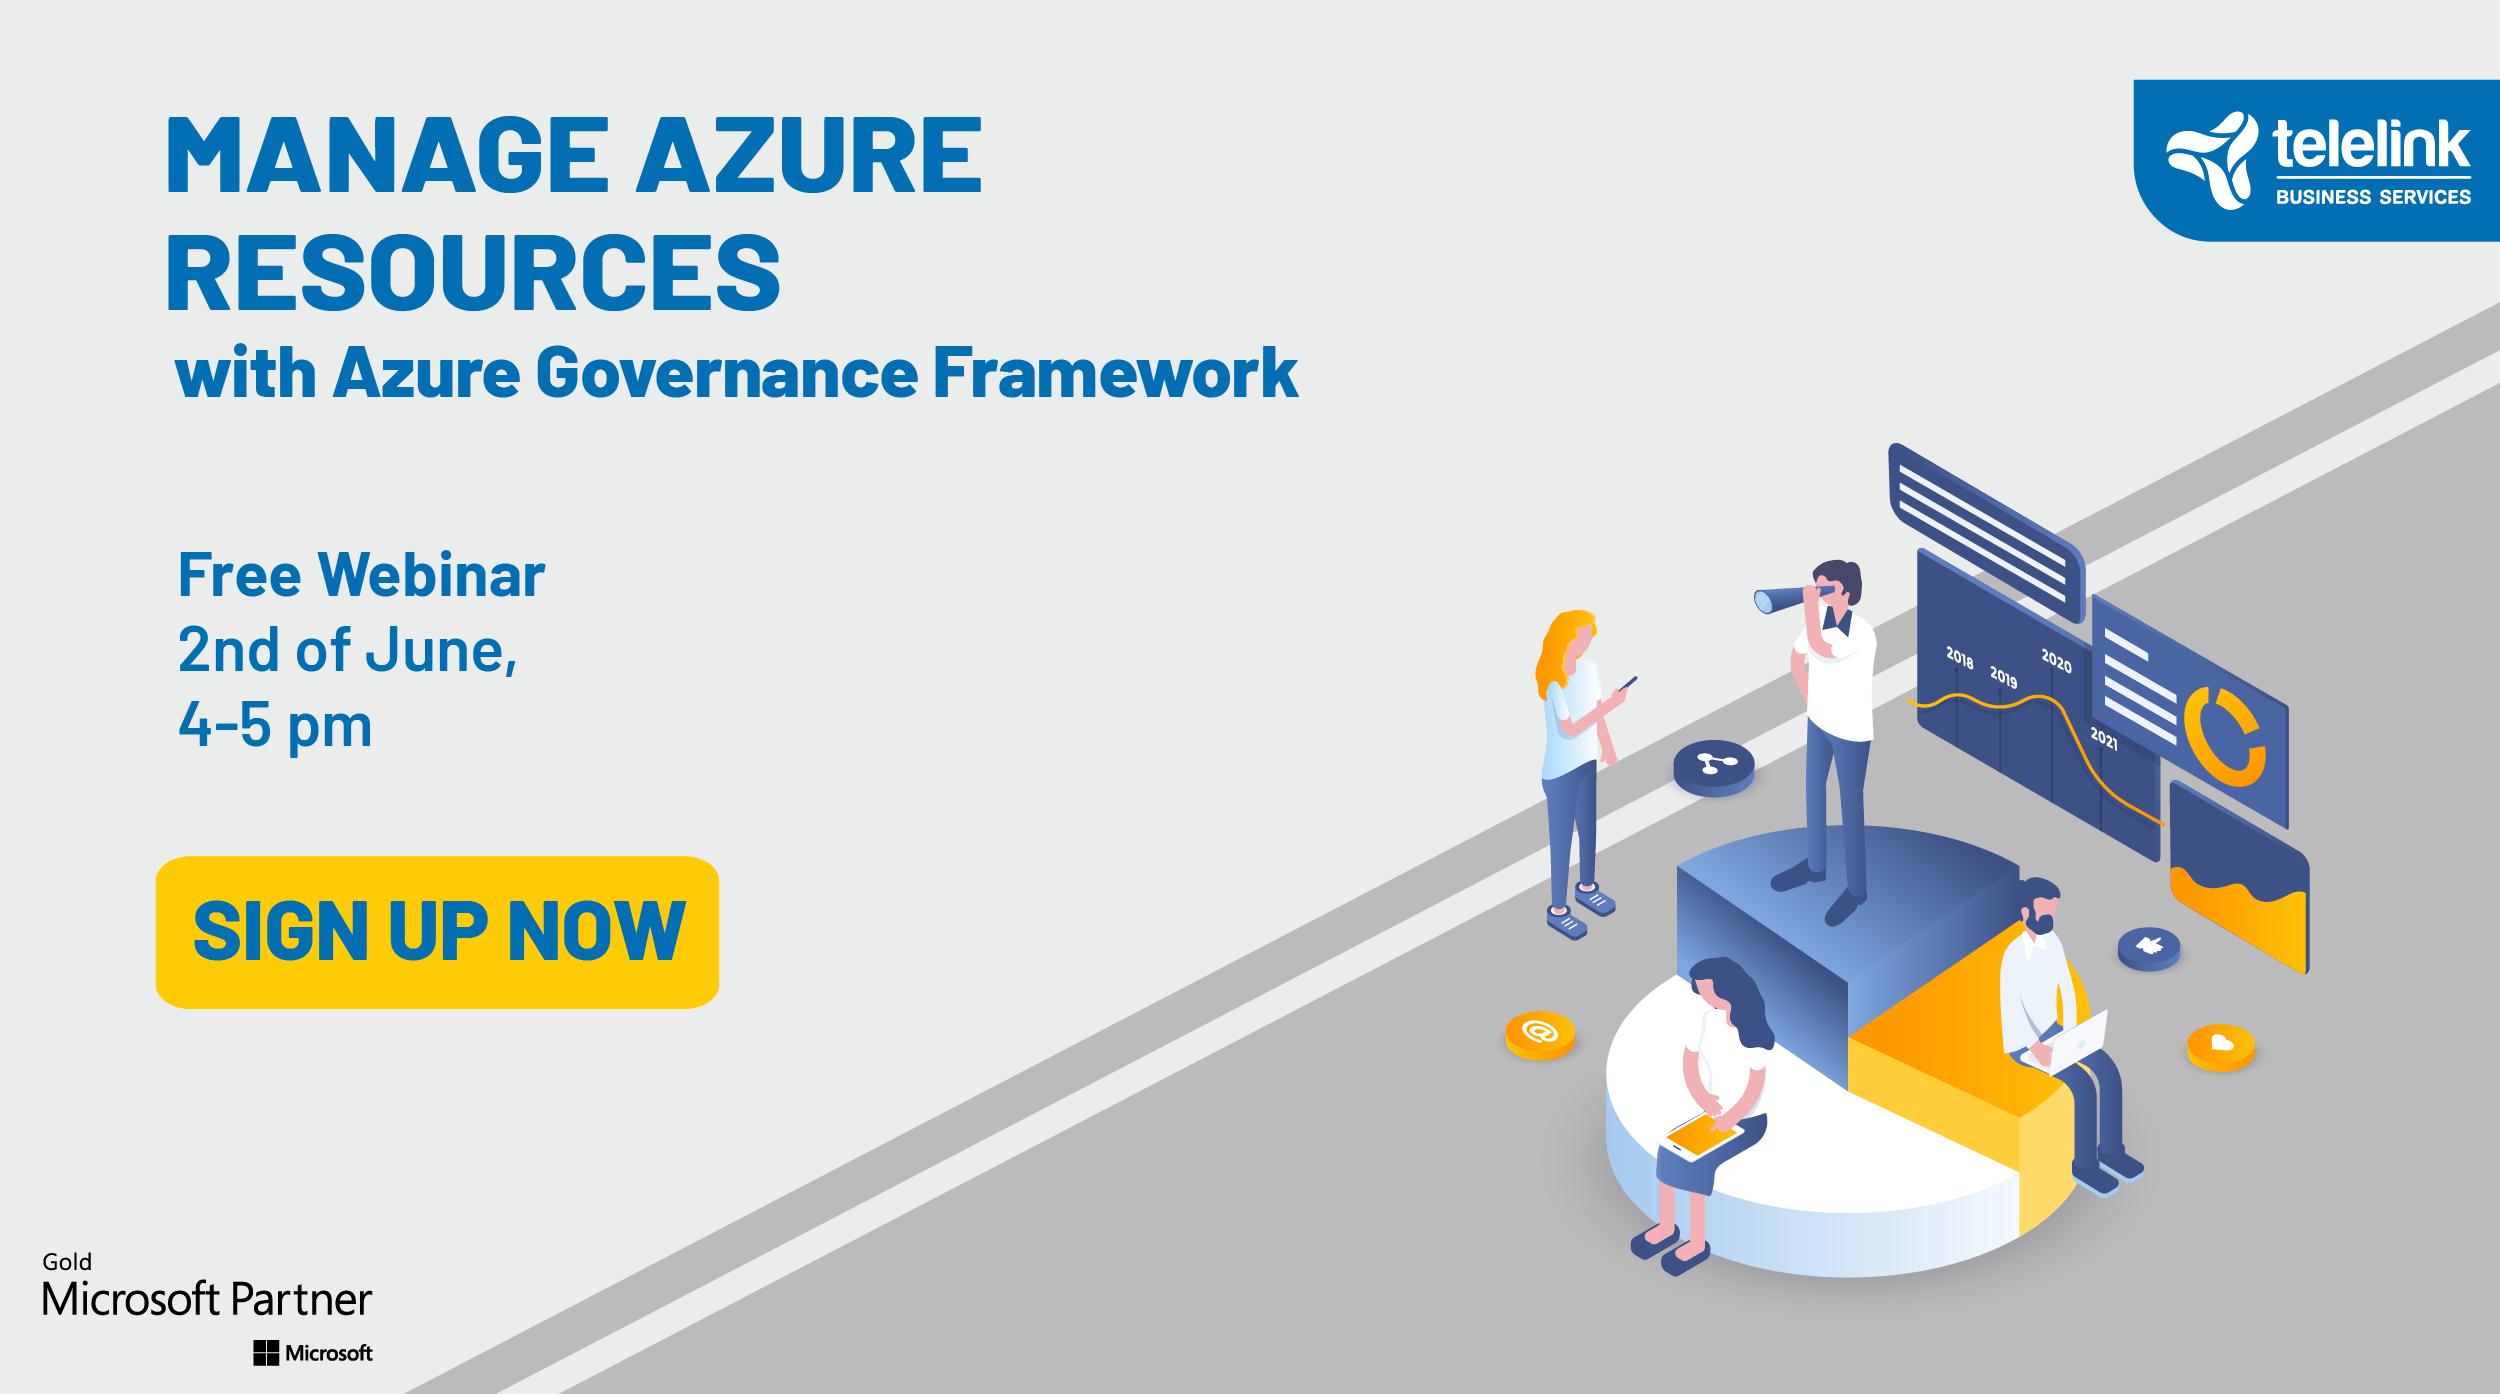 Manage Azure resources with Azure Governance Framework